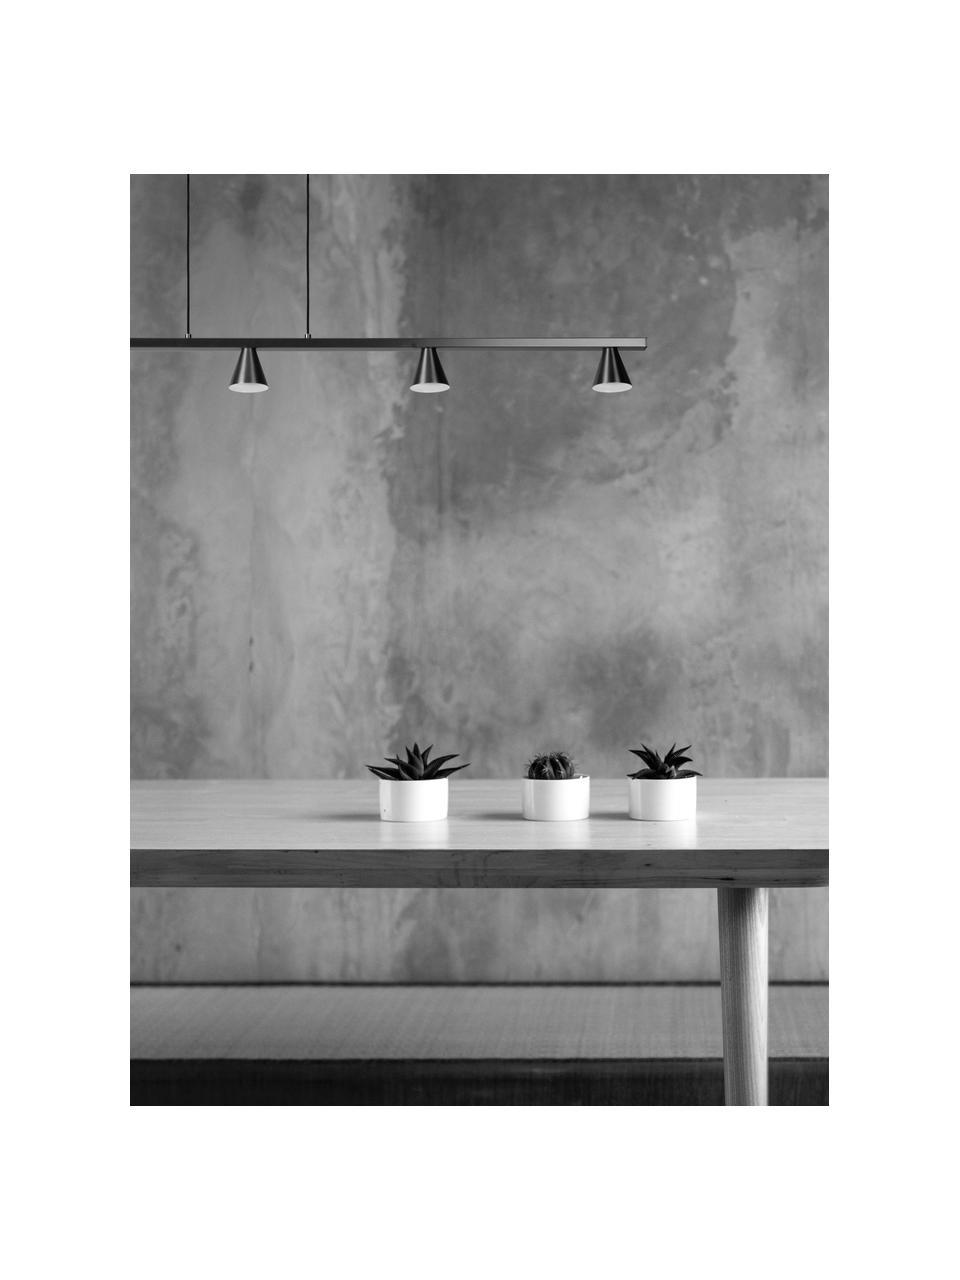 Große LED-Pendelleuchte Delano, Baldachin: Aluminium, Silberfarben, matt, 118 x 6 cm